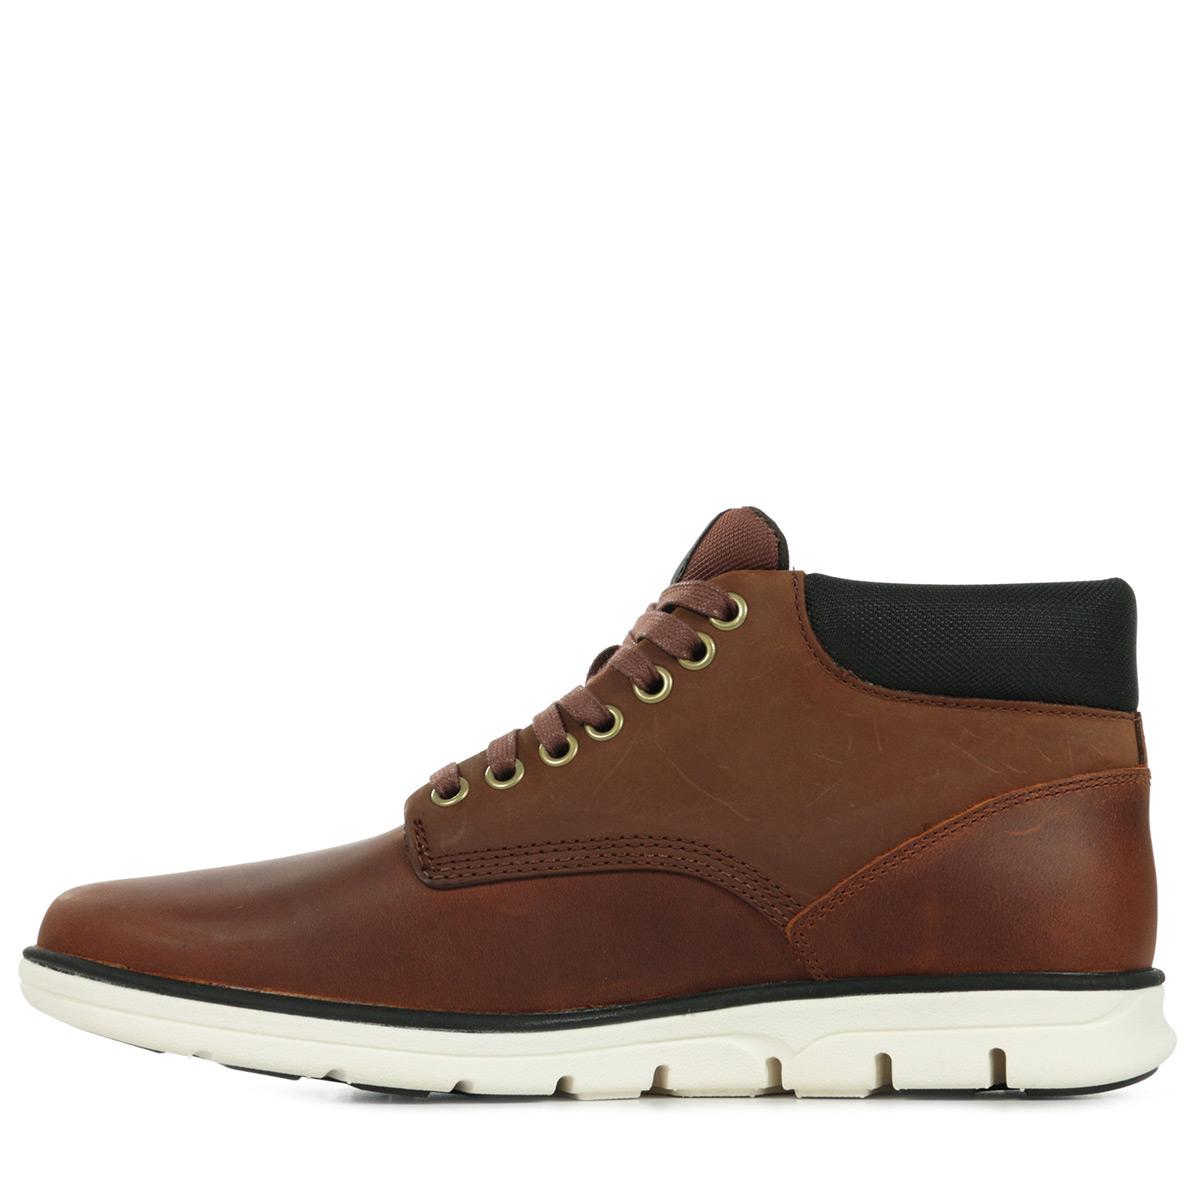 timberland bradstreet chukka leather brown ca13ee baskets mode homme. Black Bedroom Furniture Sets. Home Design Ideas